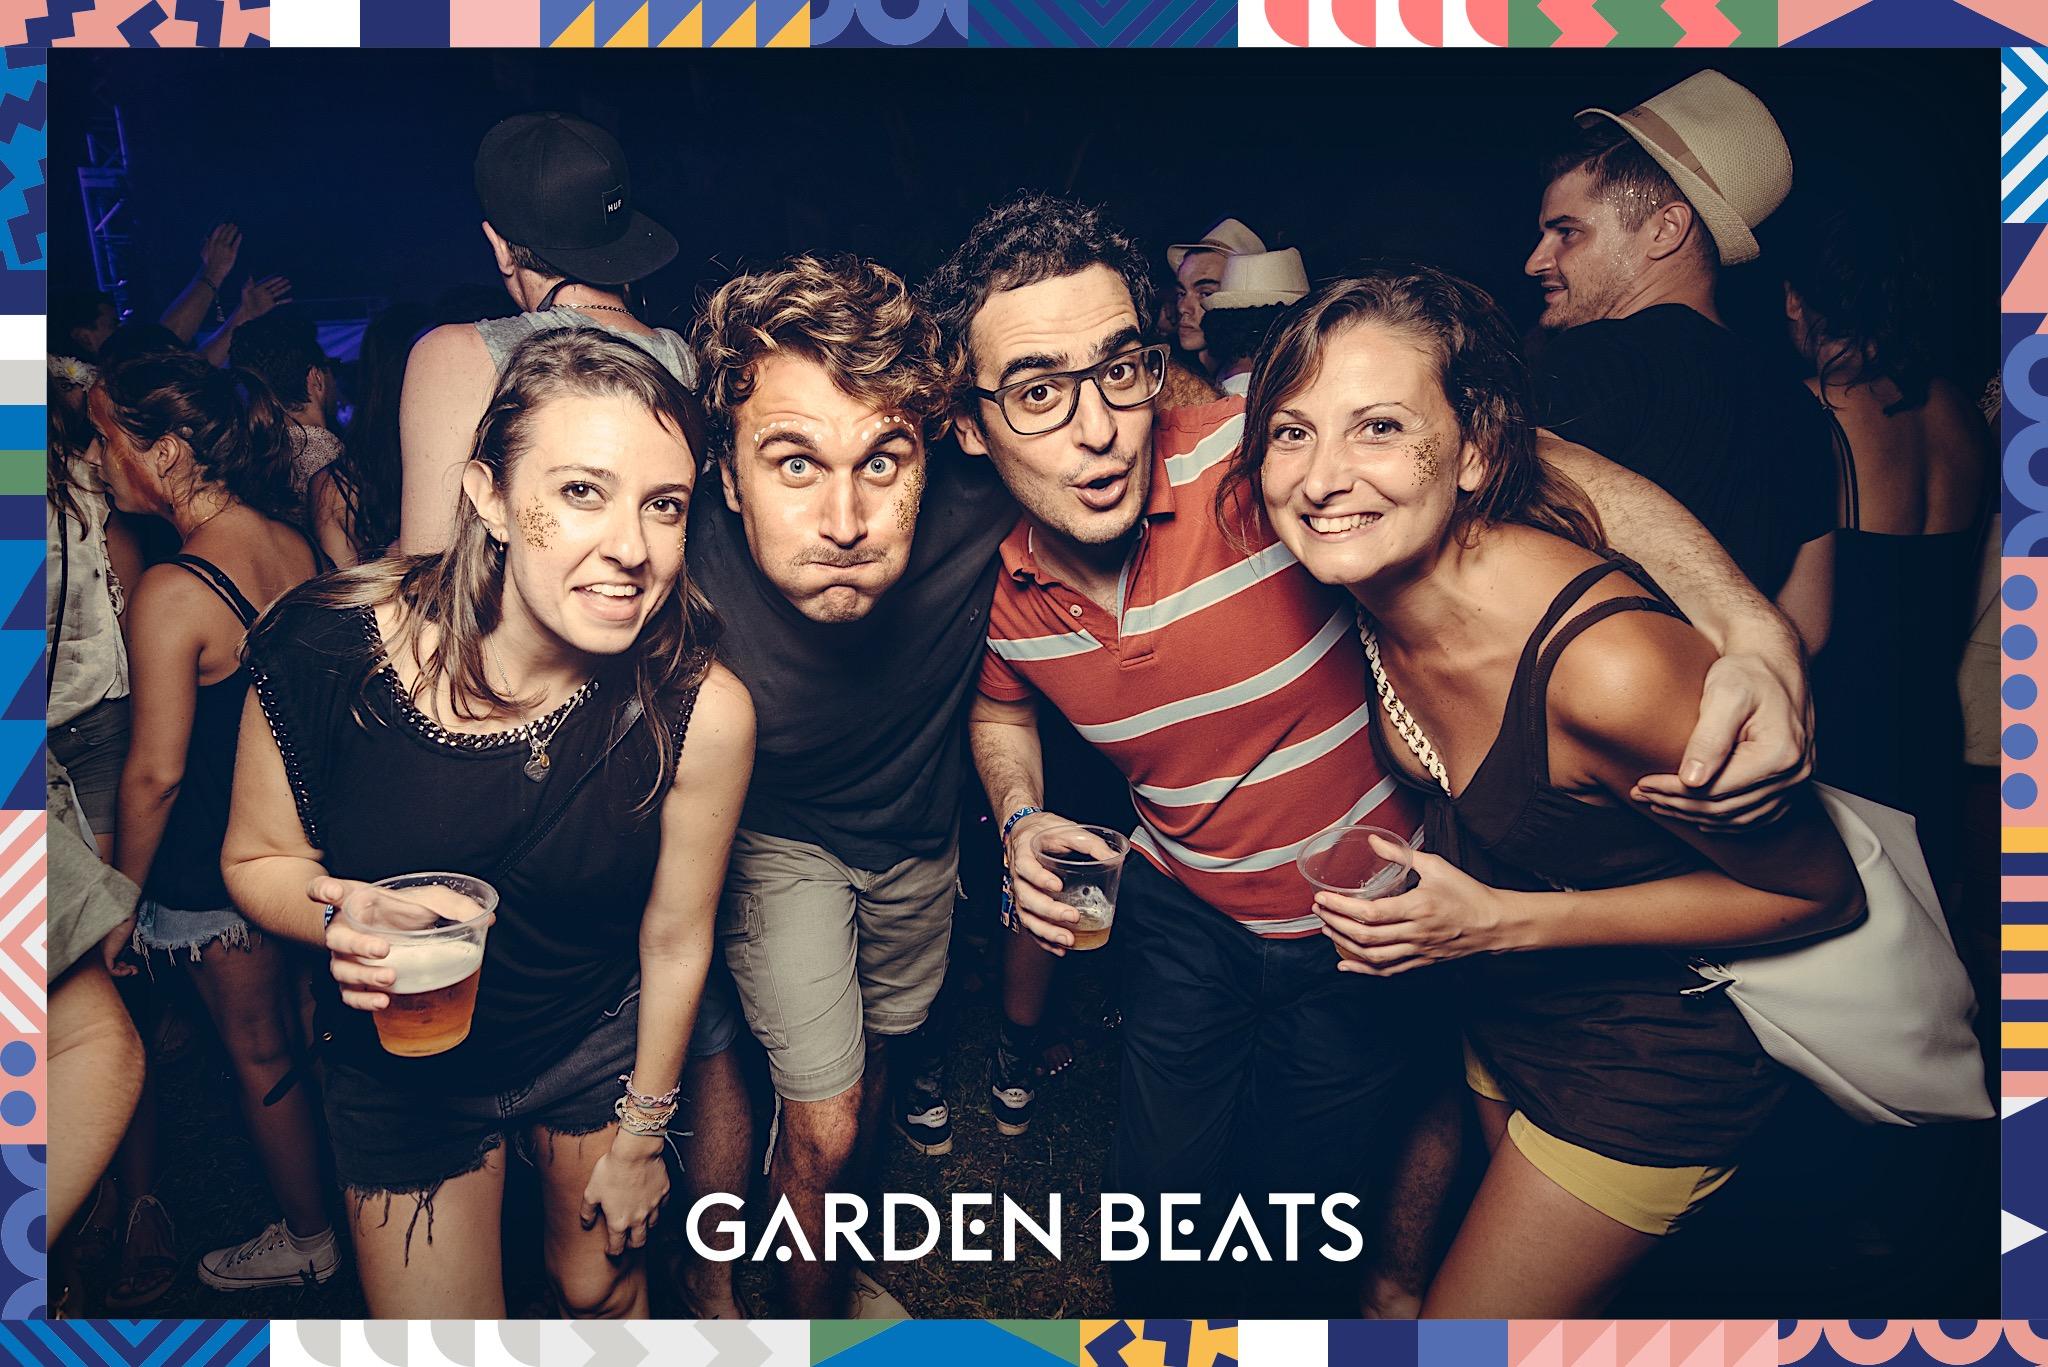 18032017_GardenBeats_Colossal788_WatermarkedGB.jpg